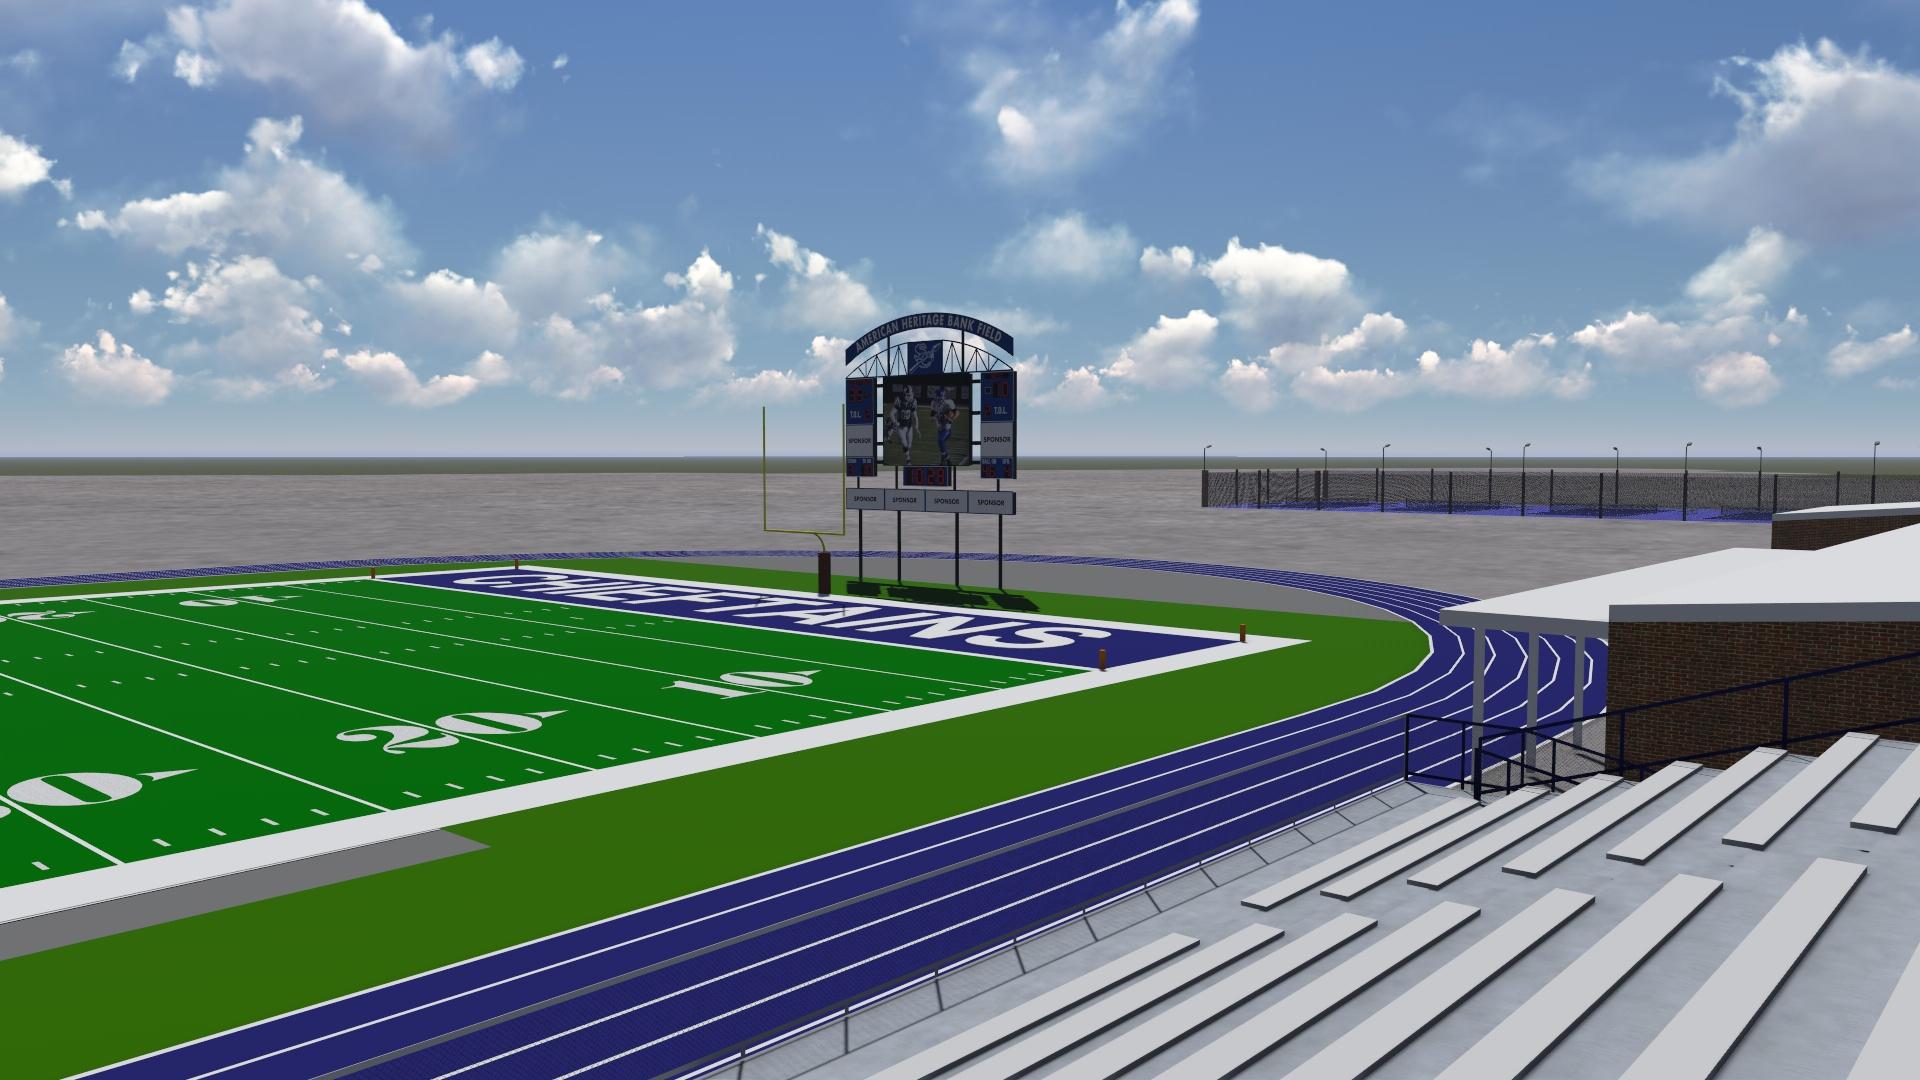 Football field rendering